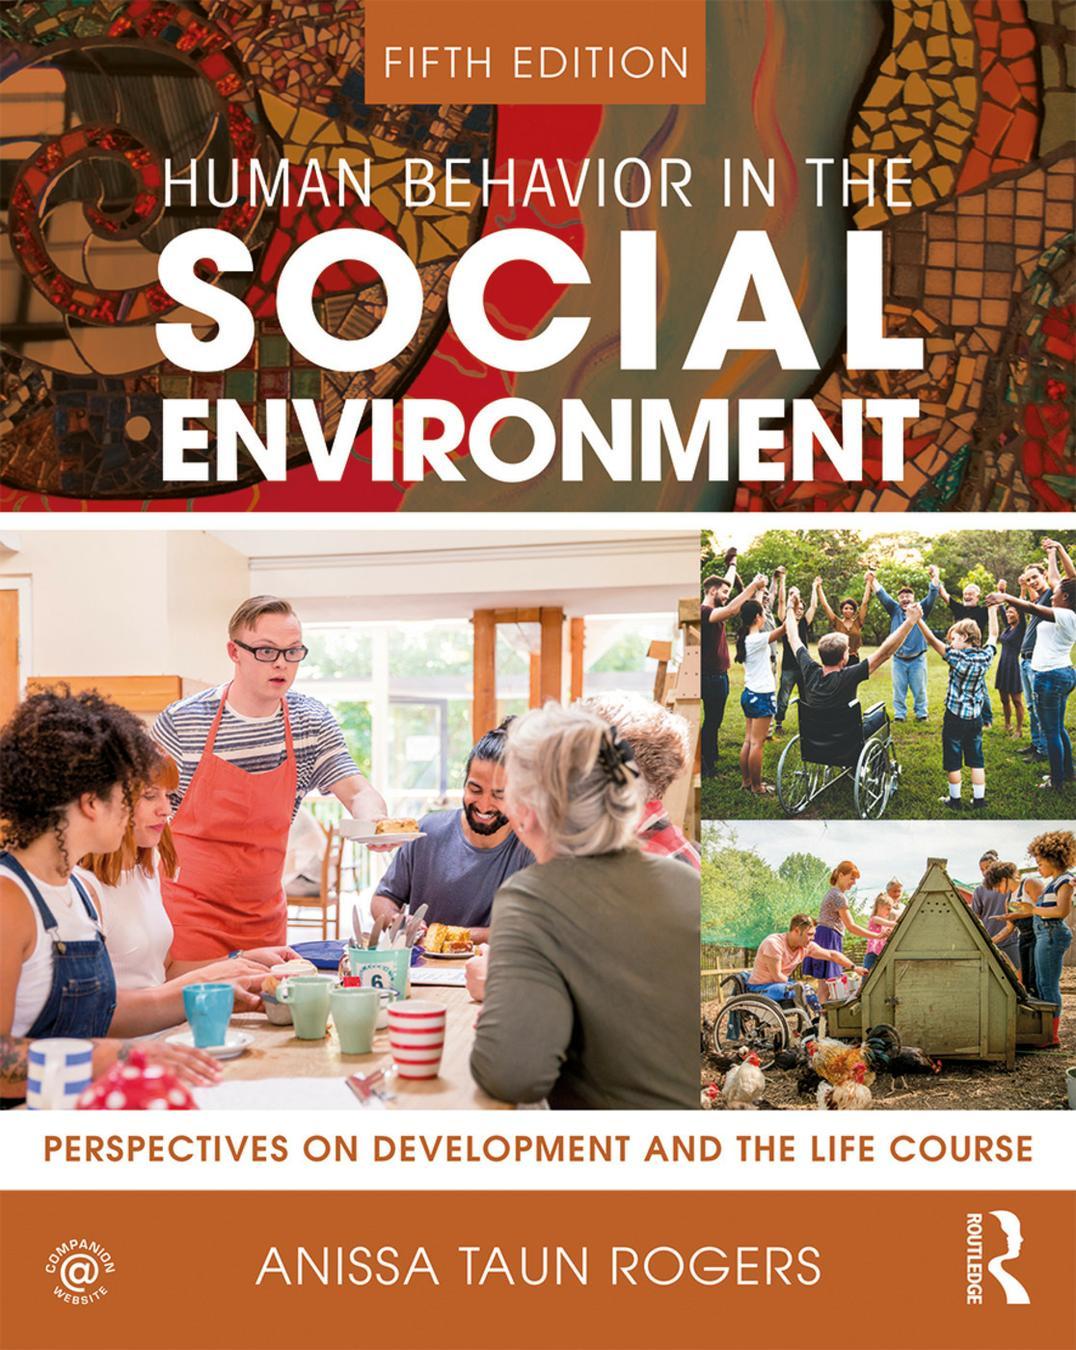 Human Behavior in the Social Environment, 5th Edition